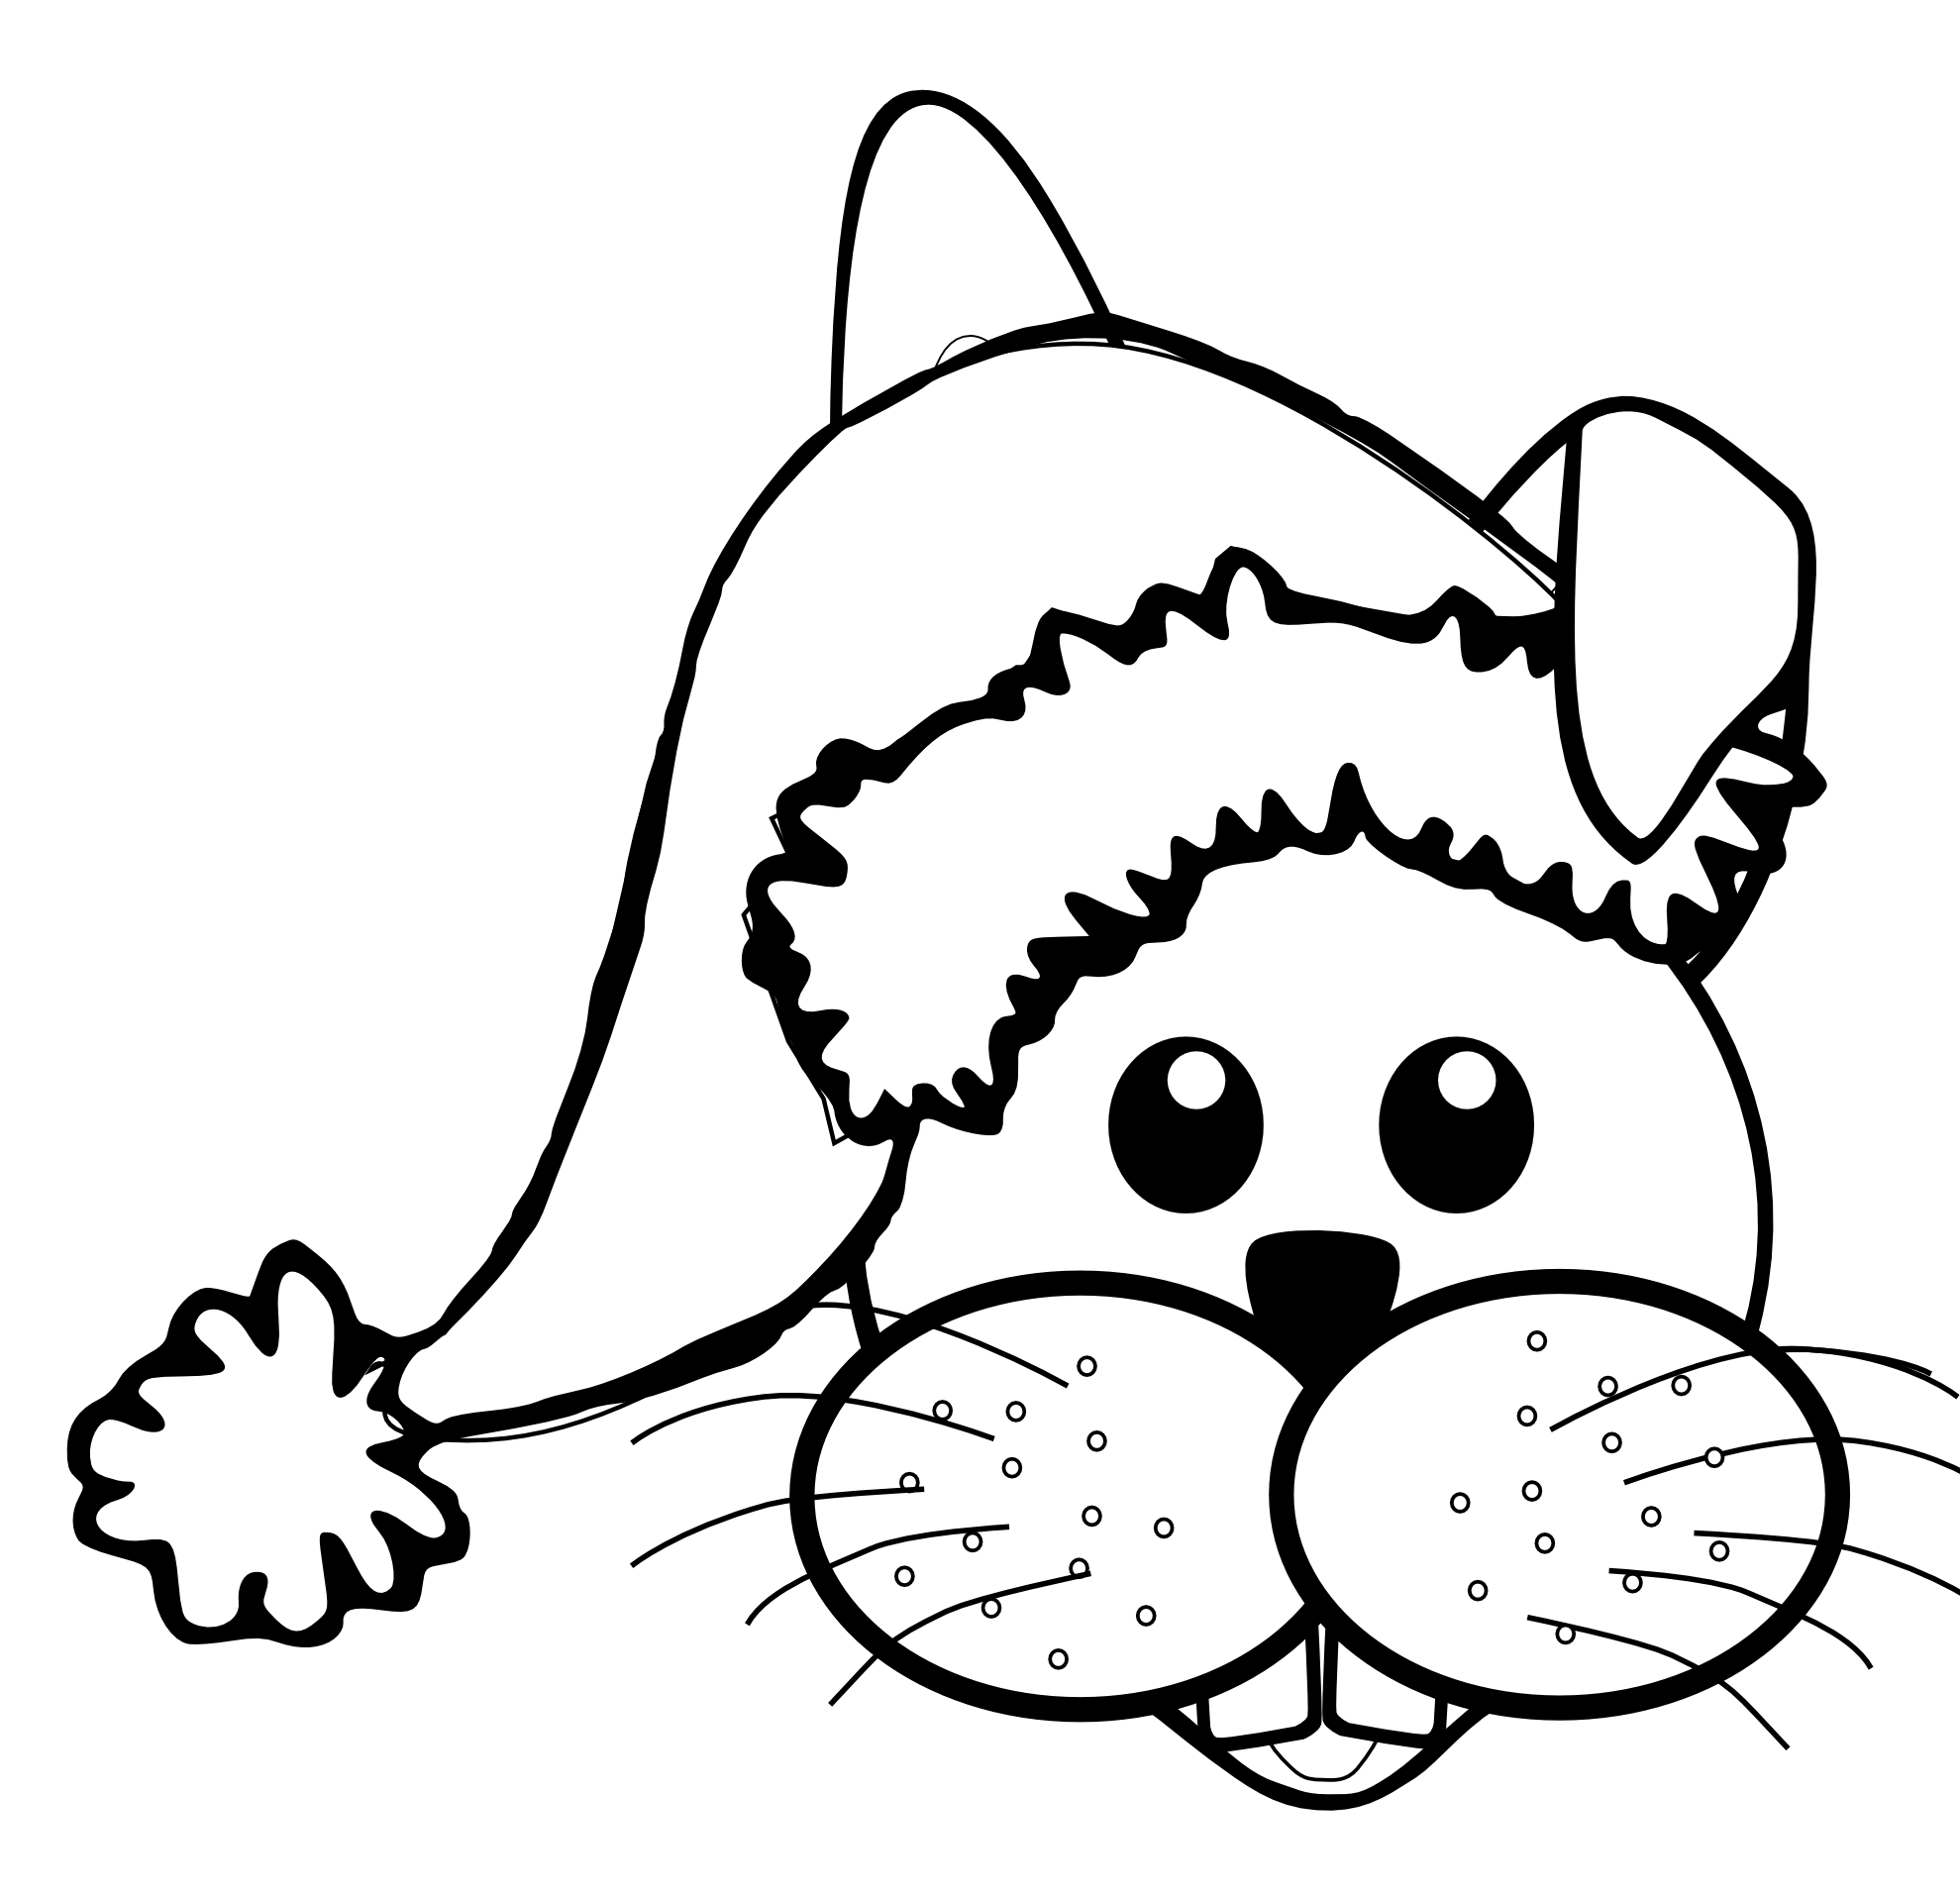 Rabbit Face Clipart | Clipart Panda - Free Clipart Images